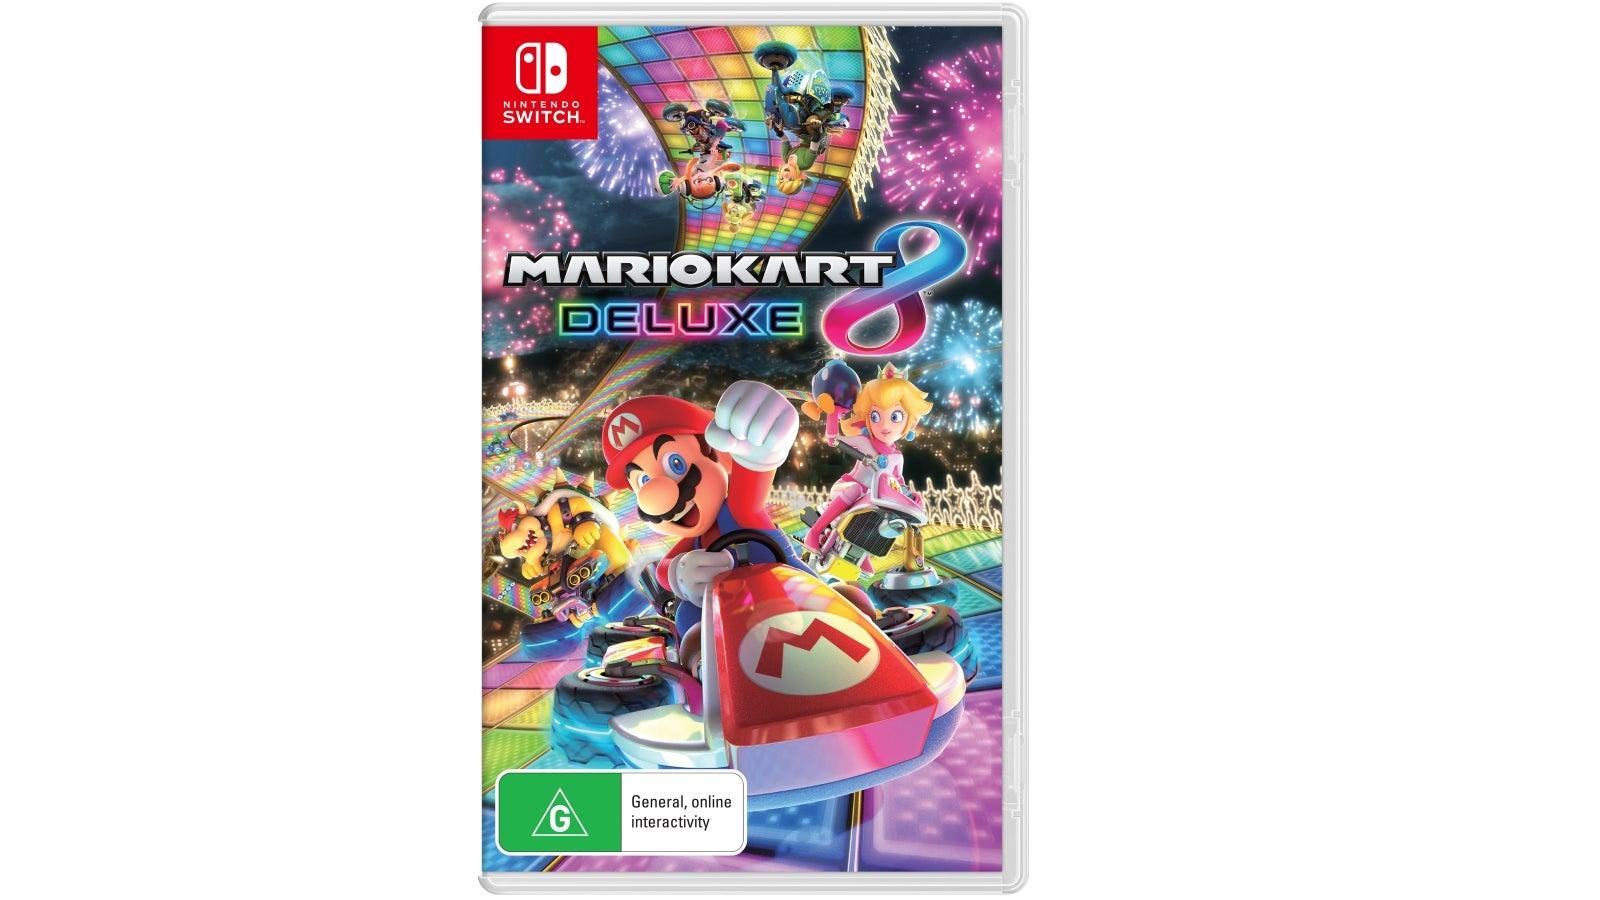 Nintendo Mario Kart 8 Deluxe Nintendo Switch Game